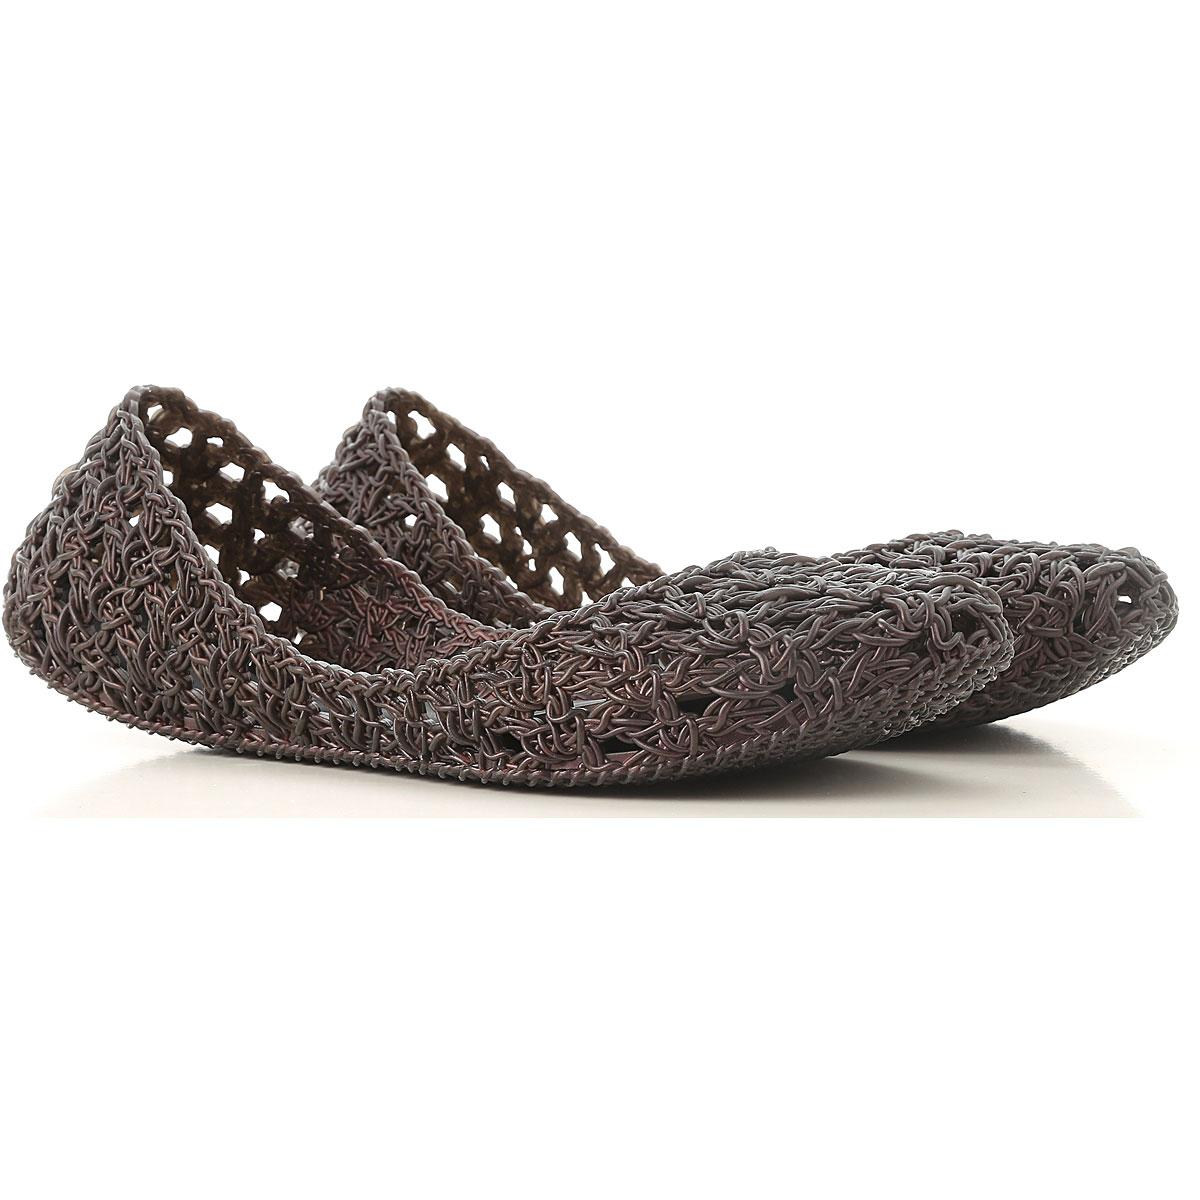 Melissa Ballet Flats Ballerina Shoes for Women On Sale, Melissa / Campana, Black, PVC, 2019, 9